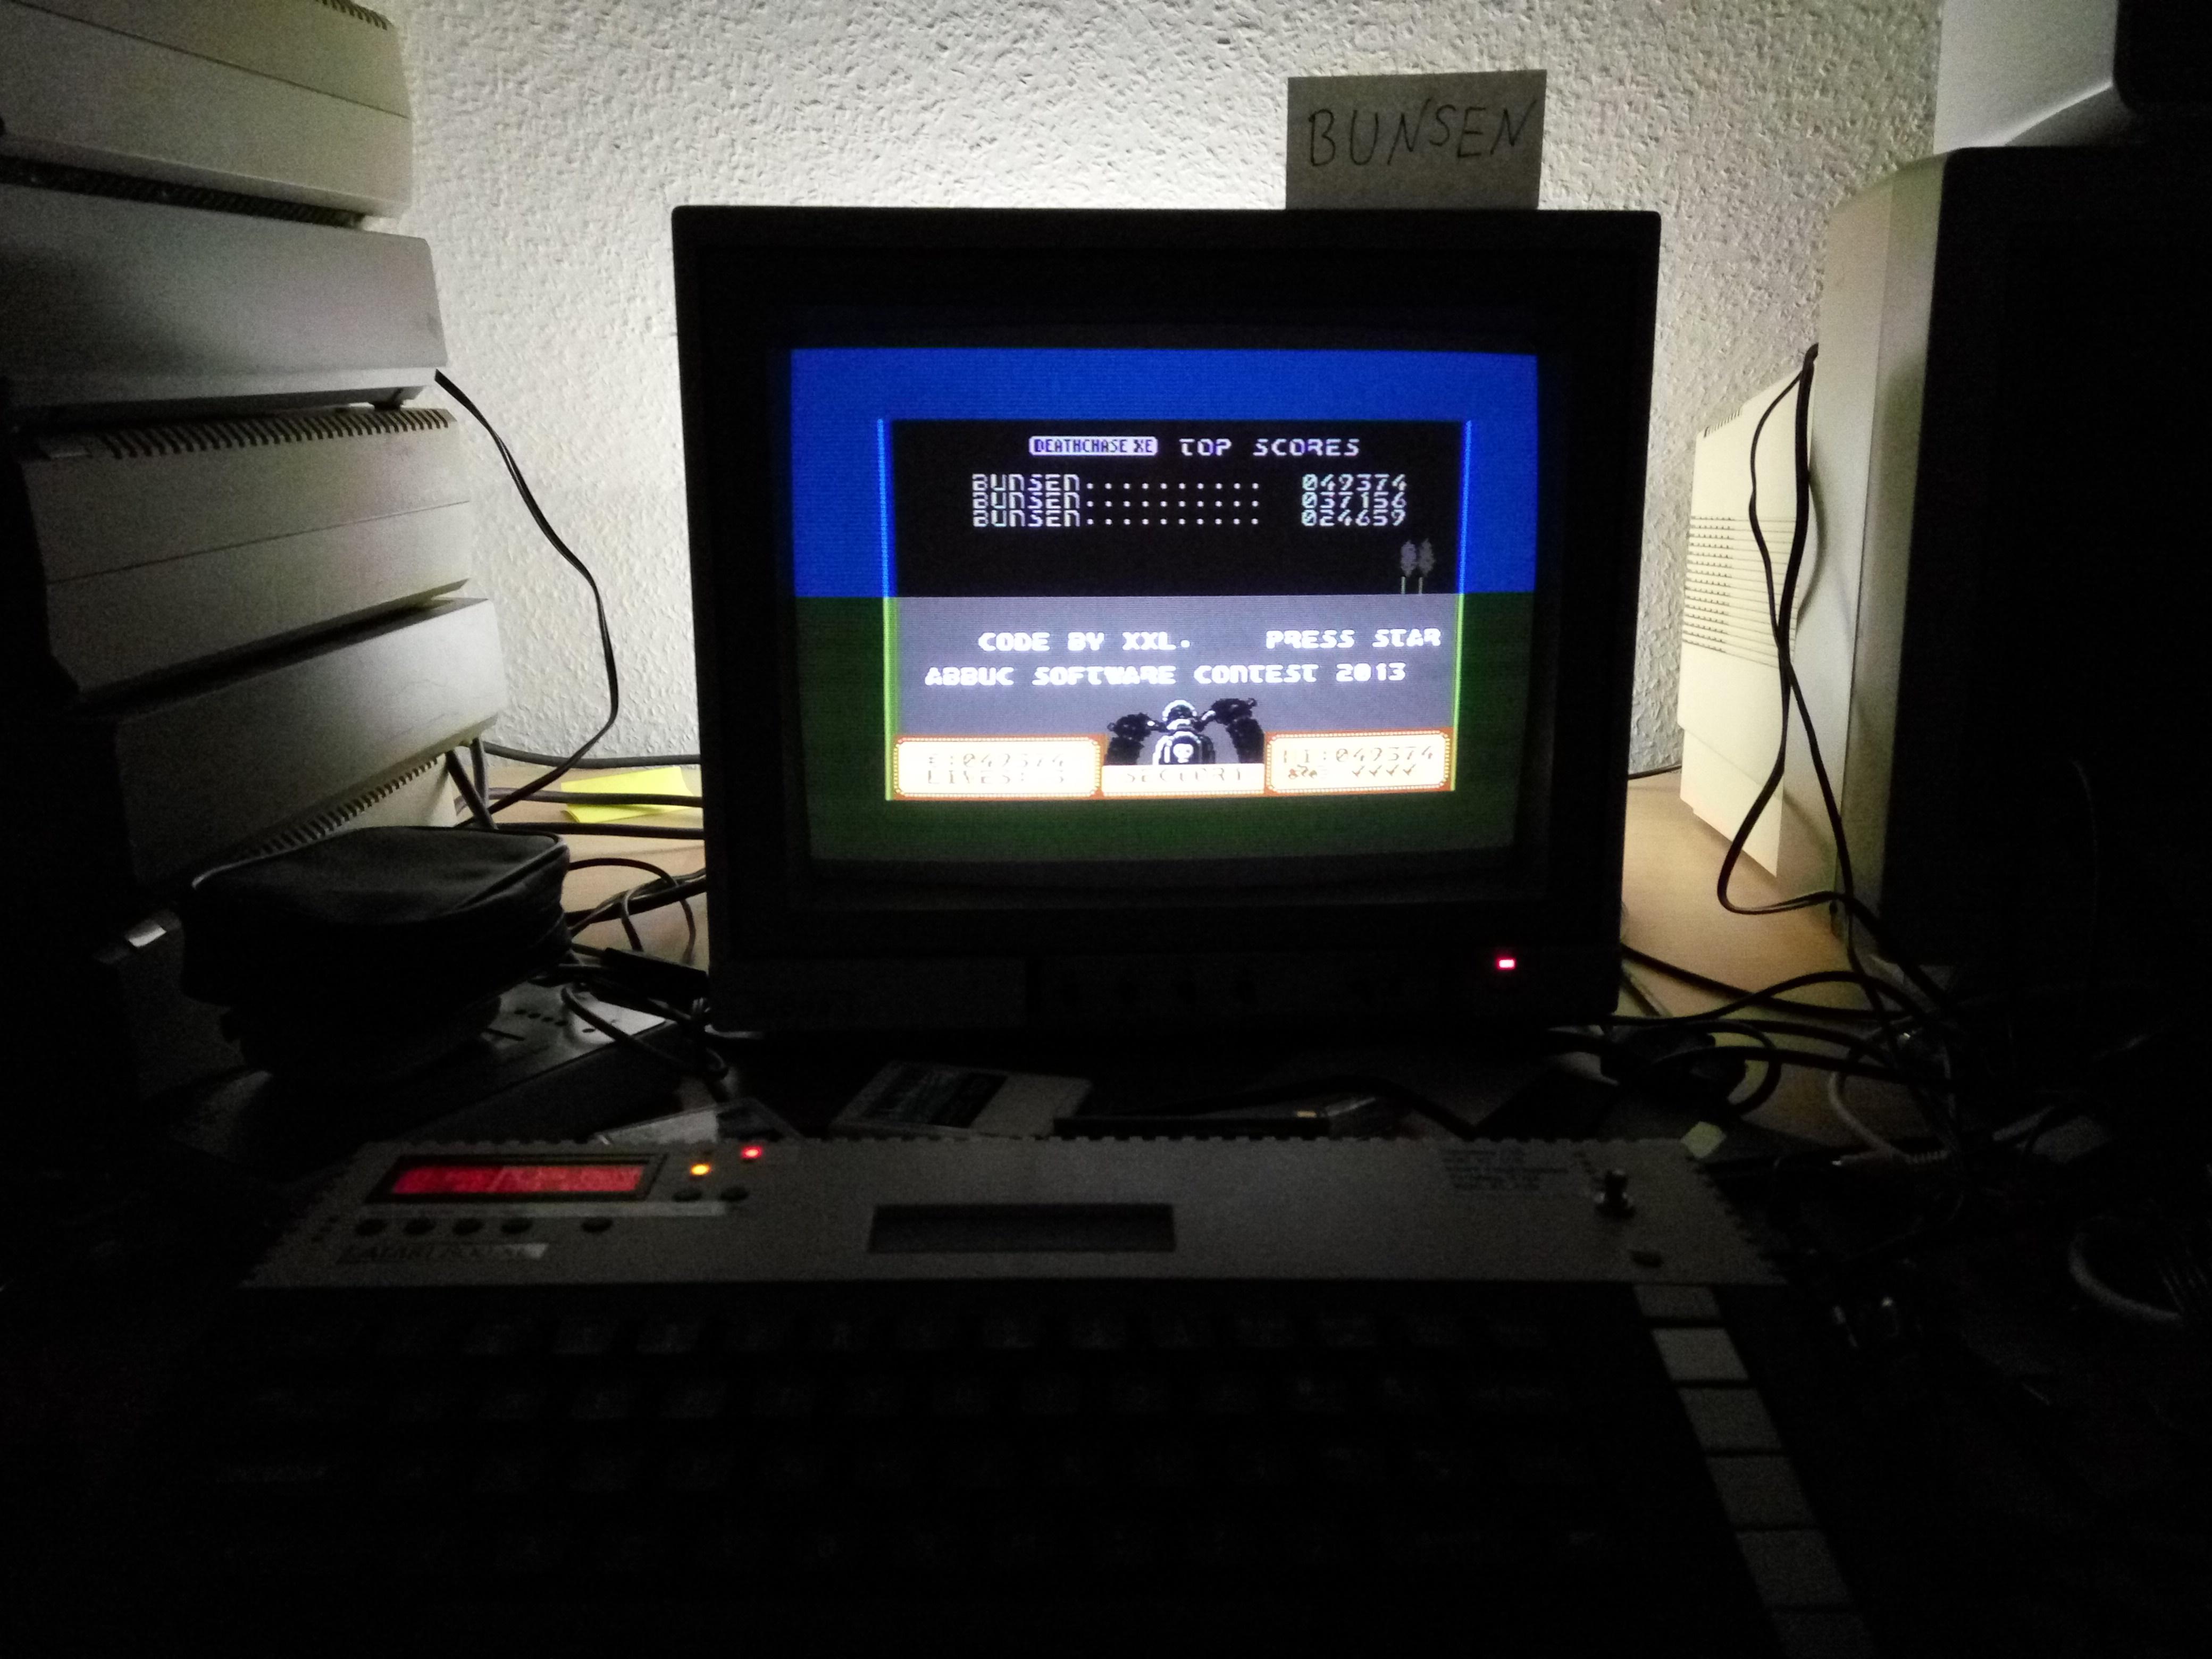 Bunsen: Deathchase XE (Atari 400/800/XL/XE) 49,374 points on 2016-09-04 12:30:09